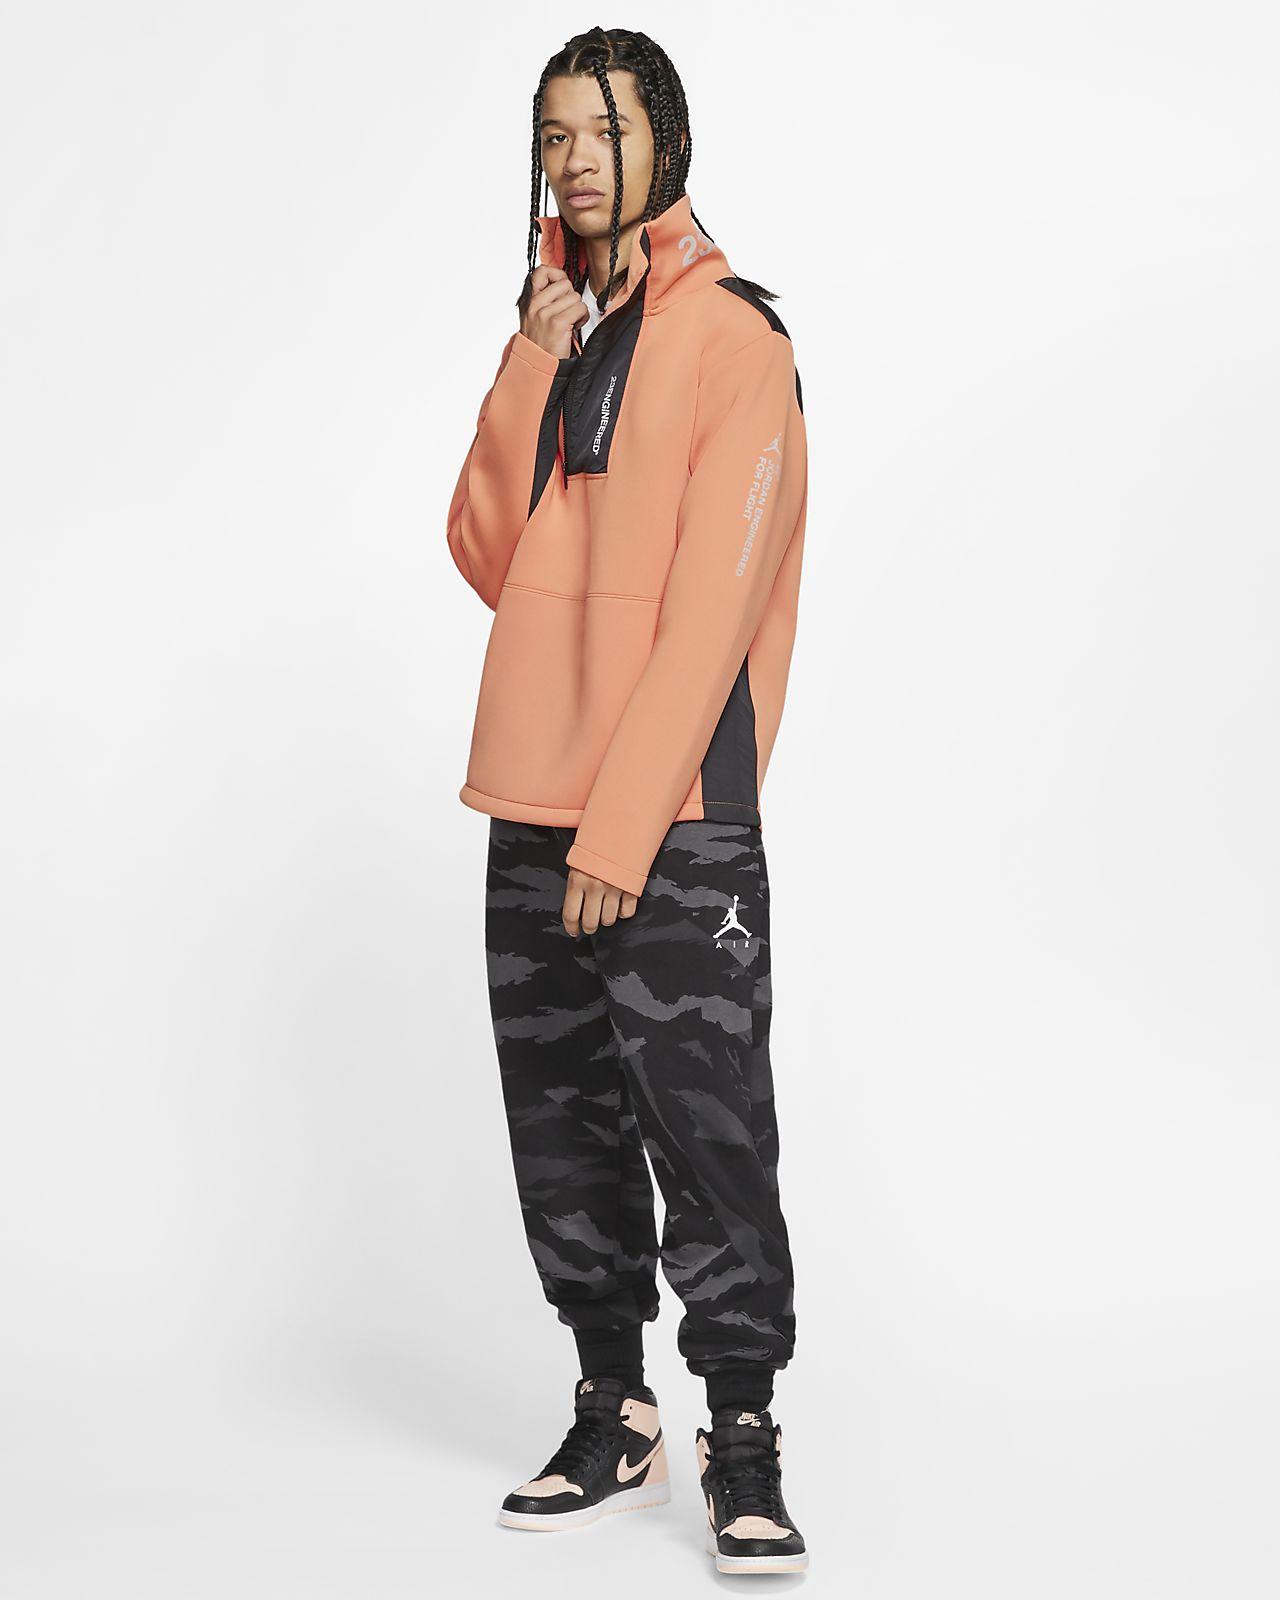 Jordan 23 Engineered Fleece Mock Neck Pullover   Nike fleece